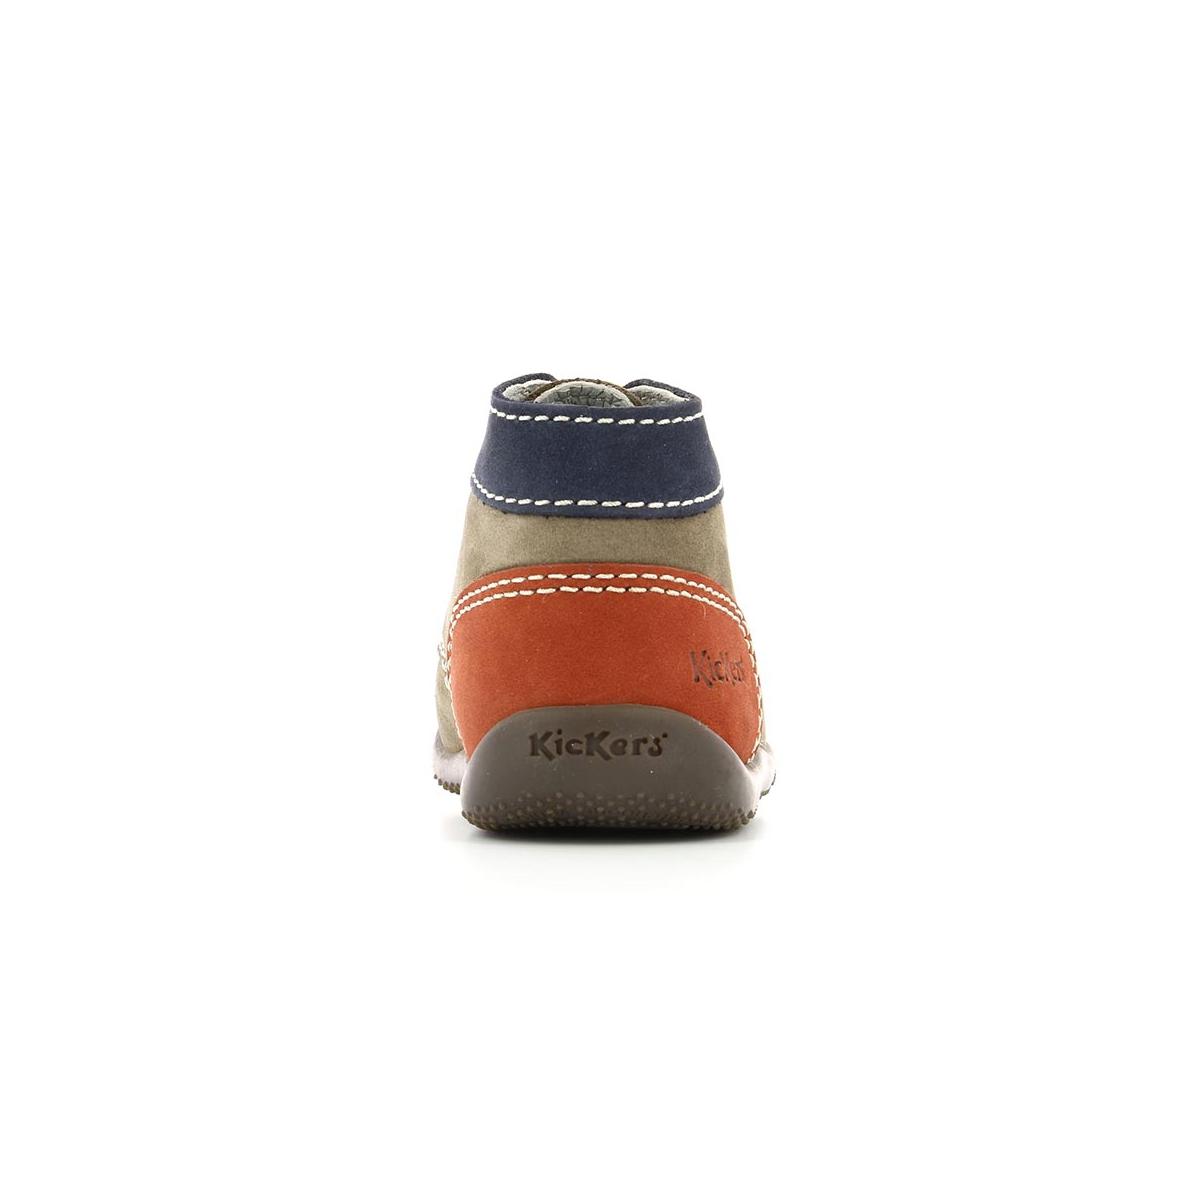 57e7c4bb1b5 Botas Bebé Bonbon gris azul naranja - Zapatos Bebé - Kickers